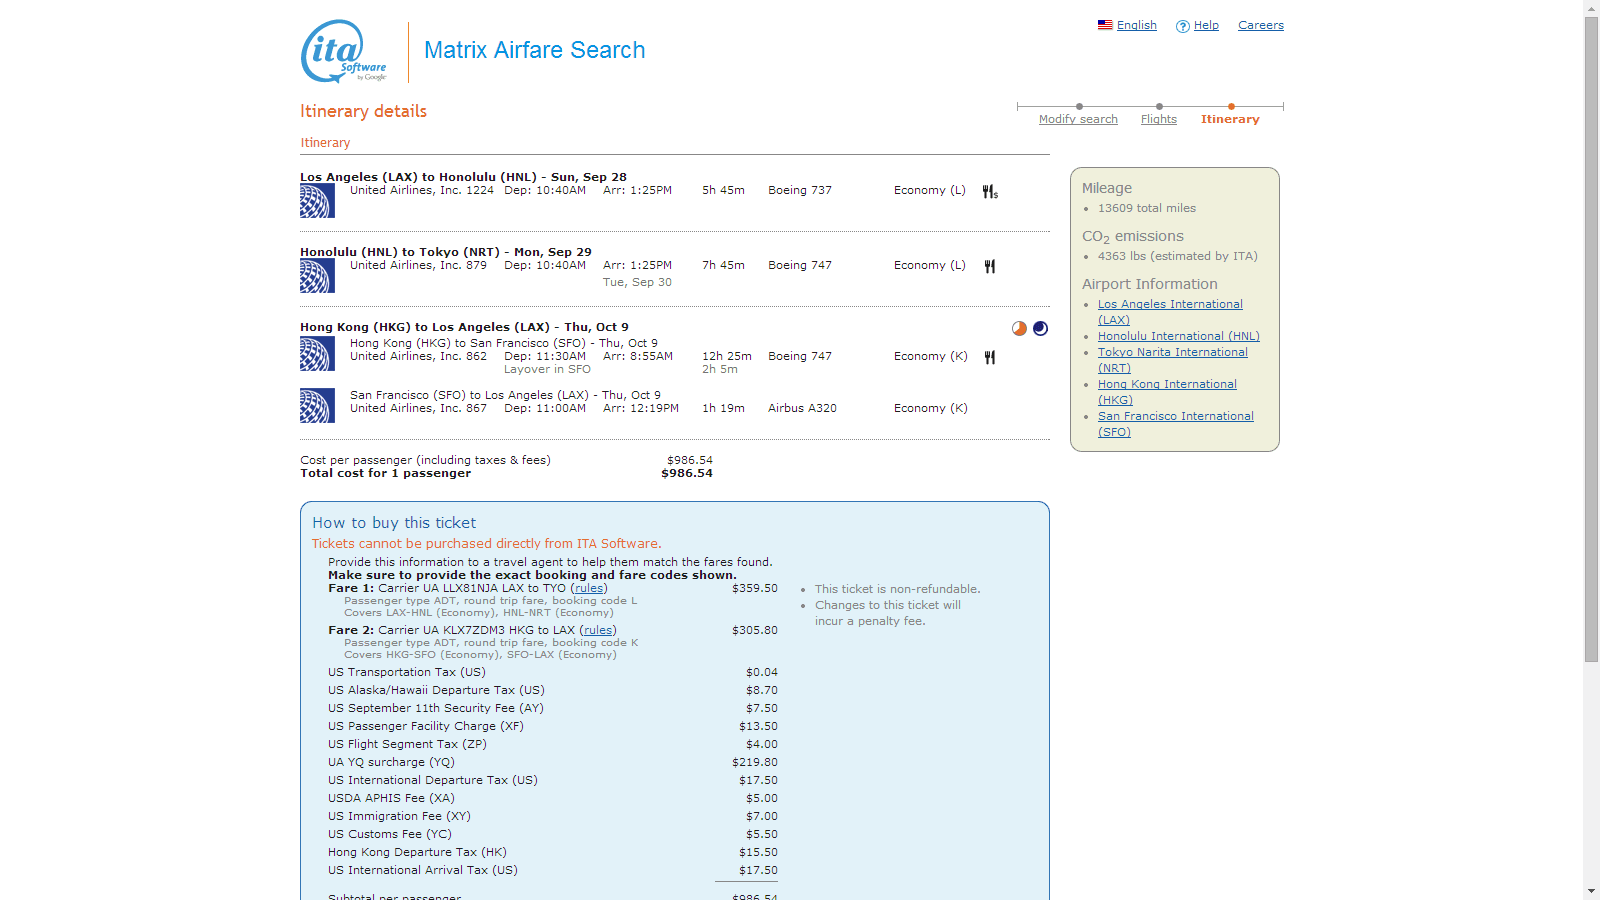 How To Visit 3 Disney Destinations On 1 Airfare Tourist Blog Tiket Disneyland Hongkong Open Date Screenshot 2014 06 09 101506